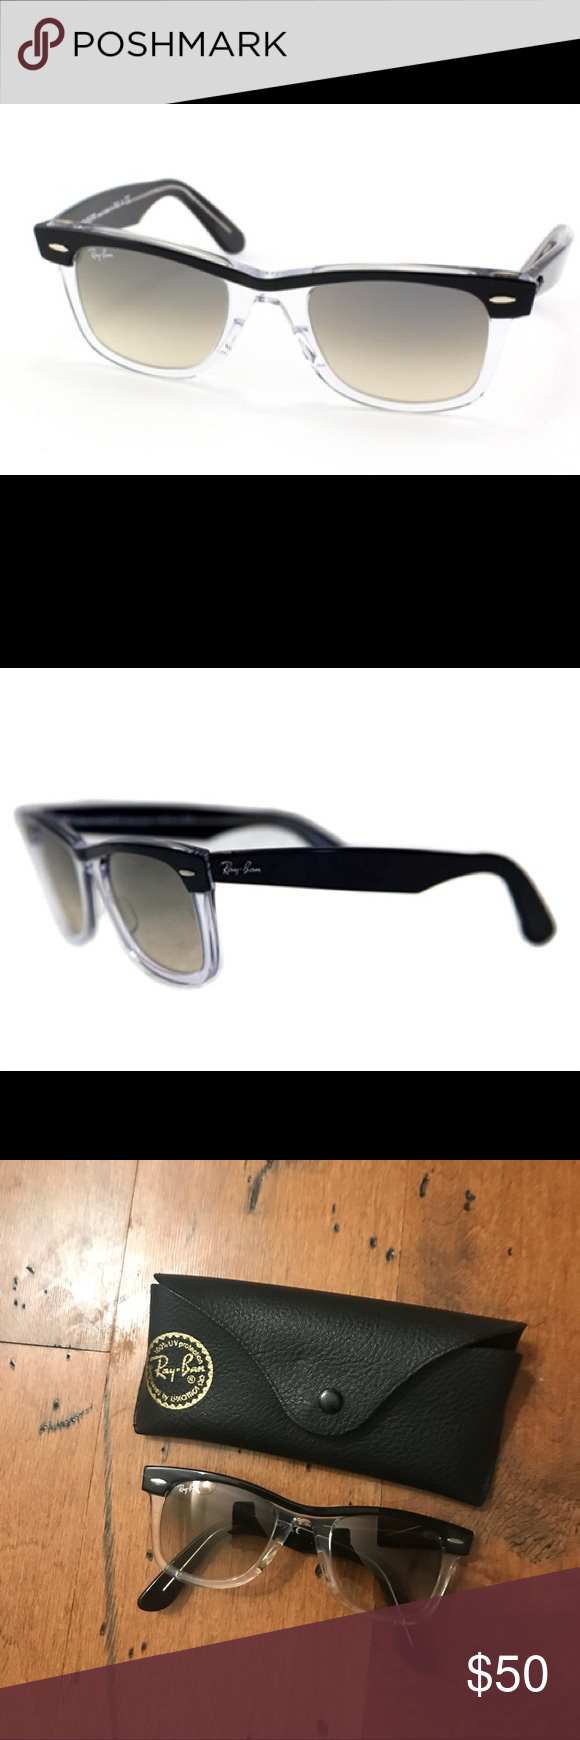 Check Out The Wayfarer Ii Classic At Ray Ban Com In 2020 Ray Ban Sunglasses Wayfarer Rayban Wayfarer Wayfarer Sunglasses